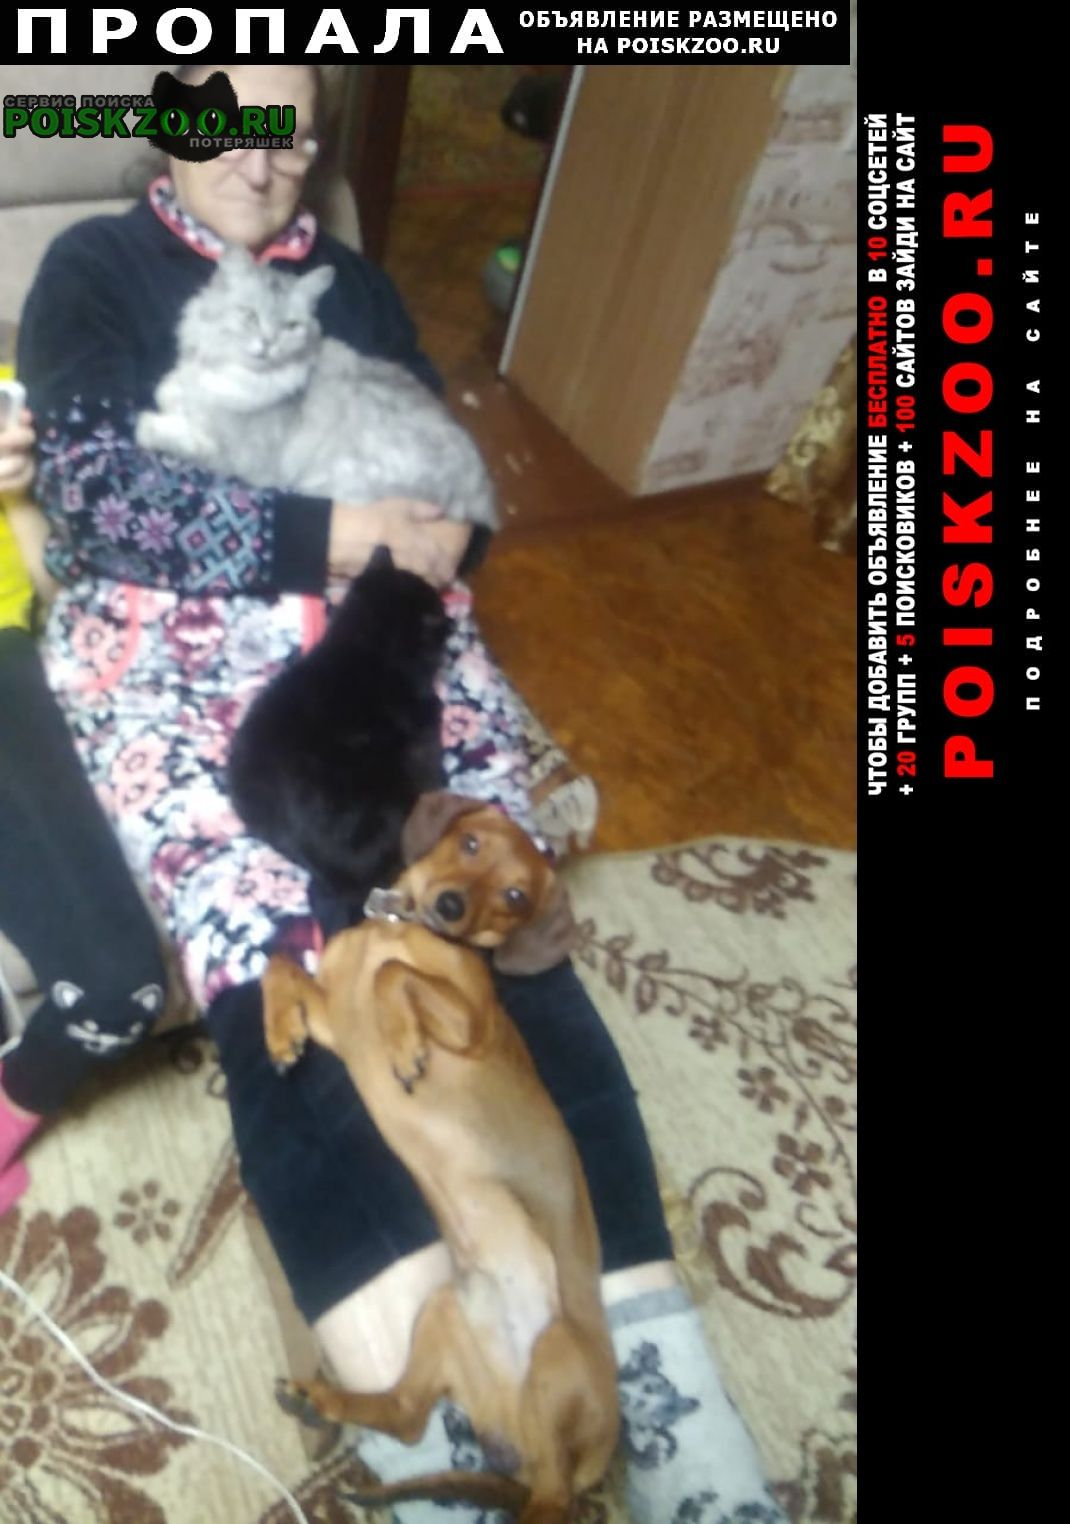 Пропала собака Барнаул